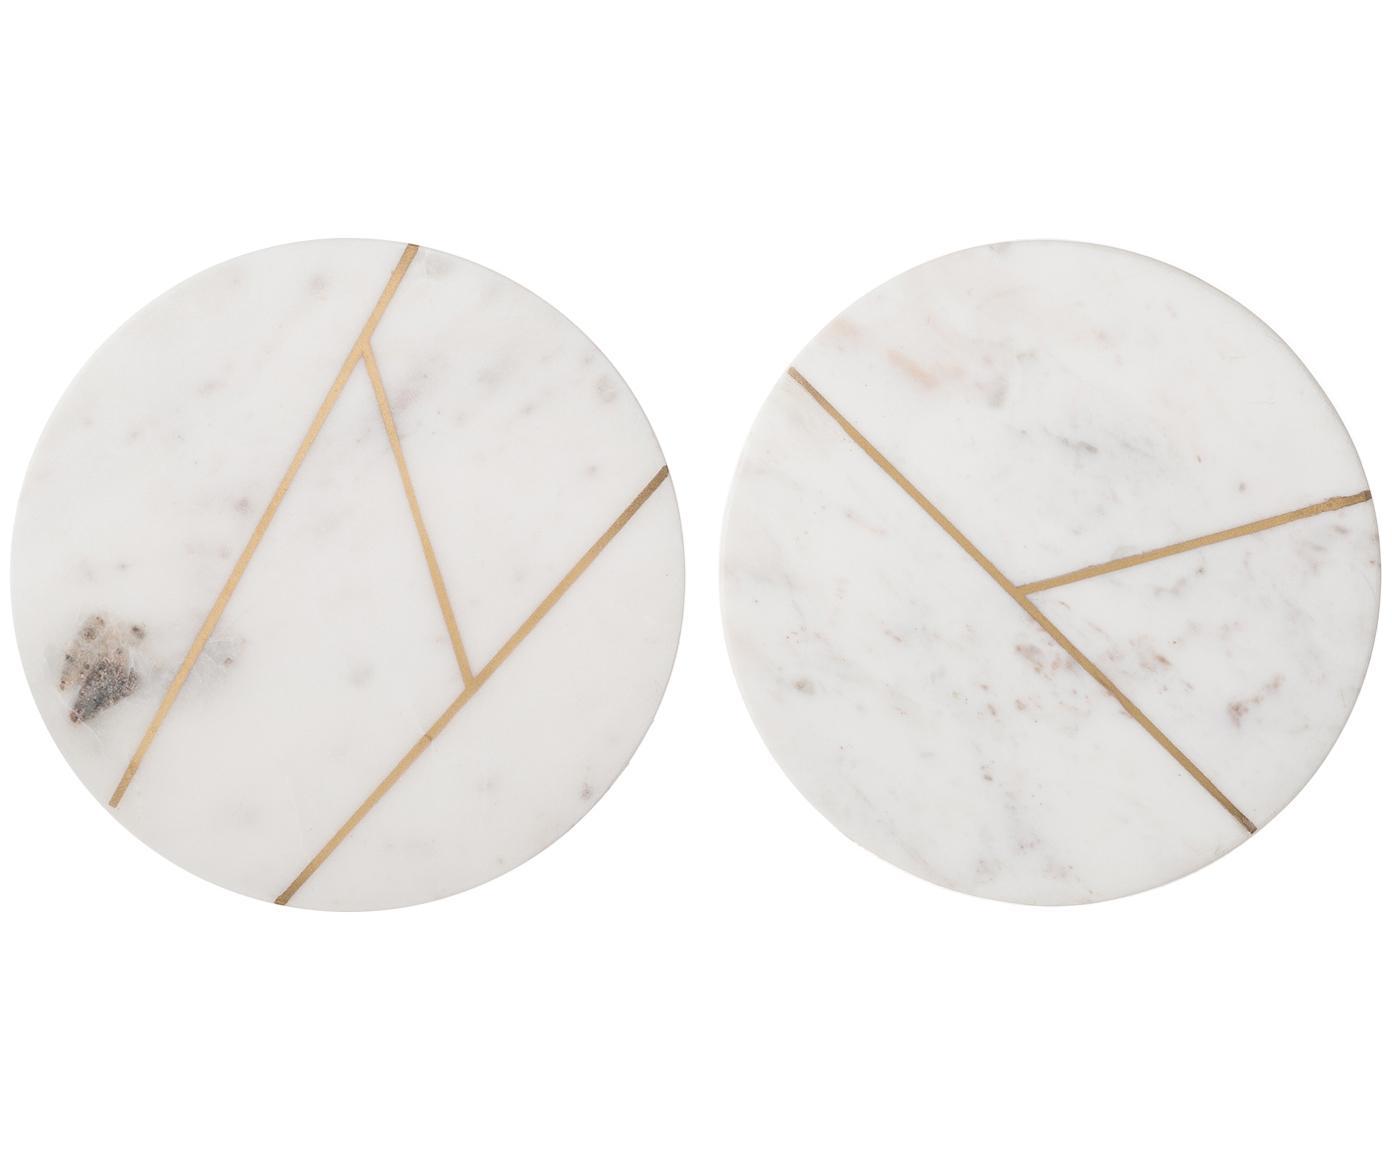 Marmeren tegelset Marble, 2-delig, 100% marmer, Wit, gemarmerd, goudkleurig, Ø 18 cm